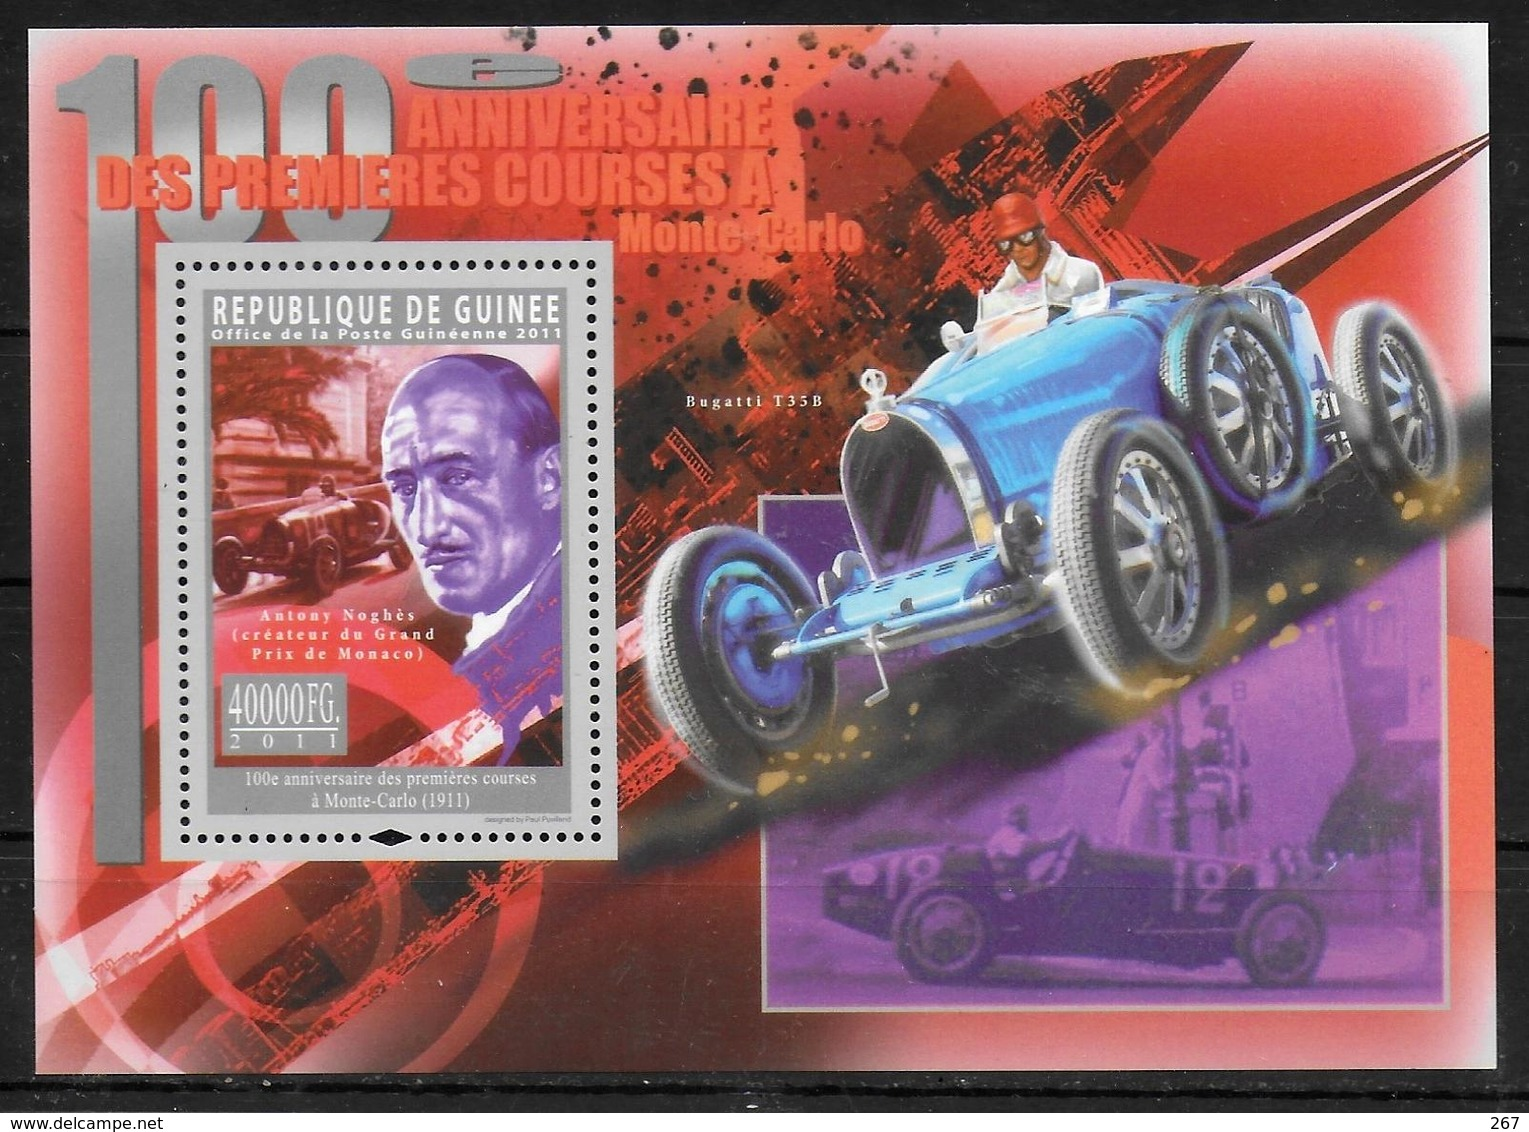 GUINEE  BF 1268  * *  ( Cote 20e ) Automobile Anthony Noghes Prix De Monaco - Cars